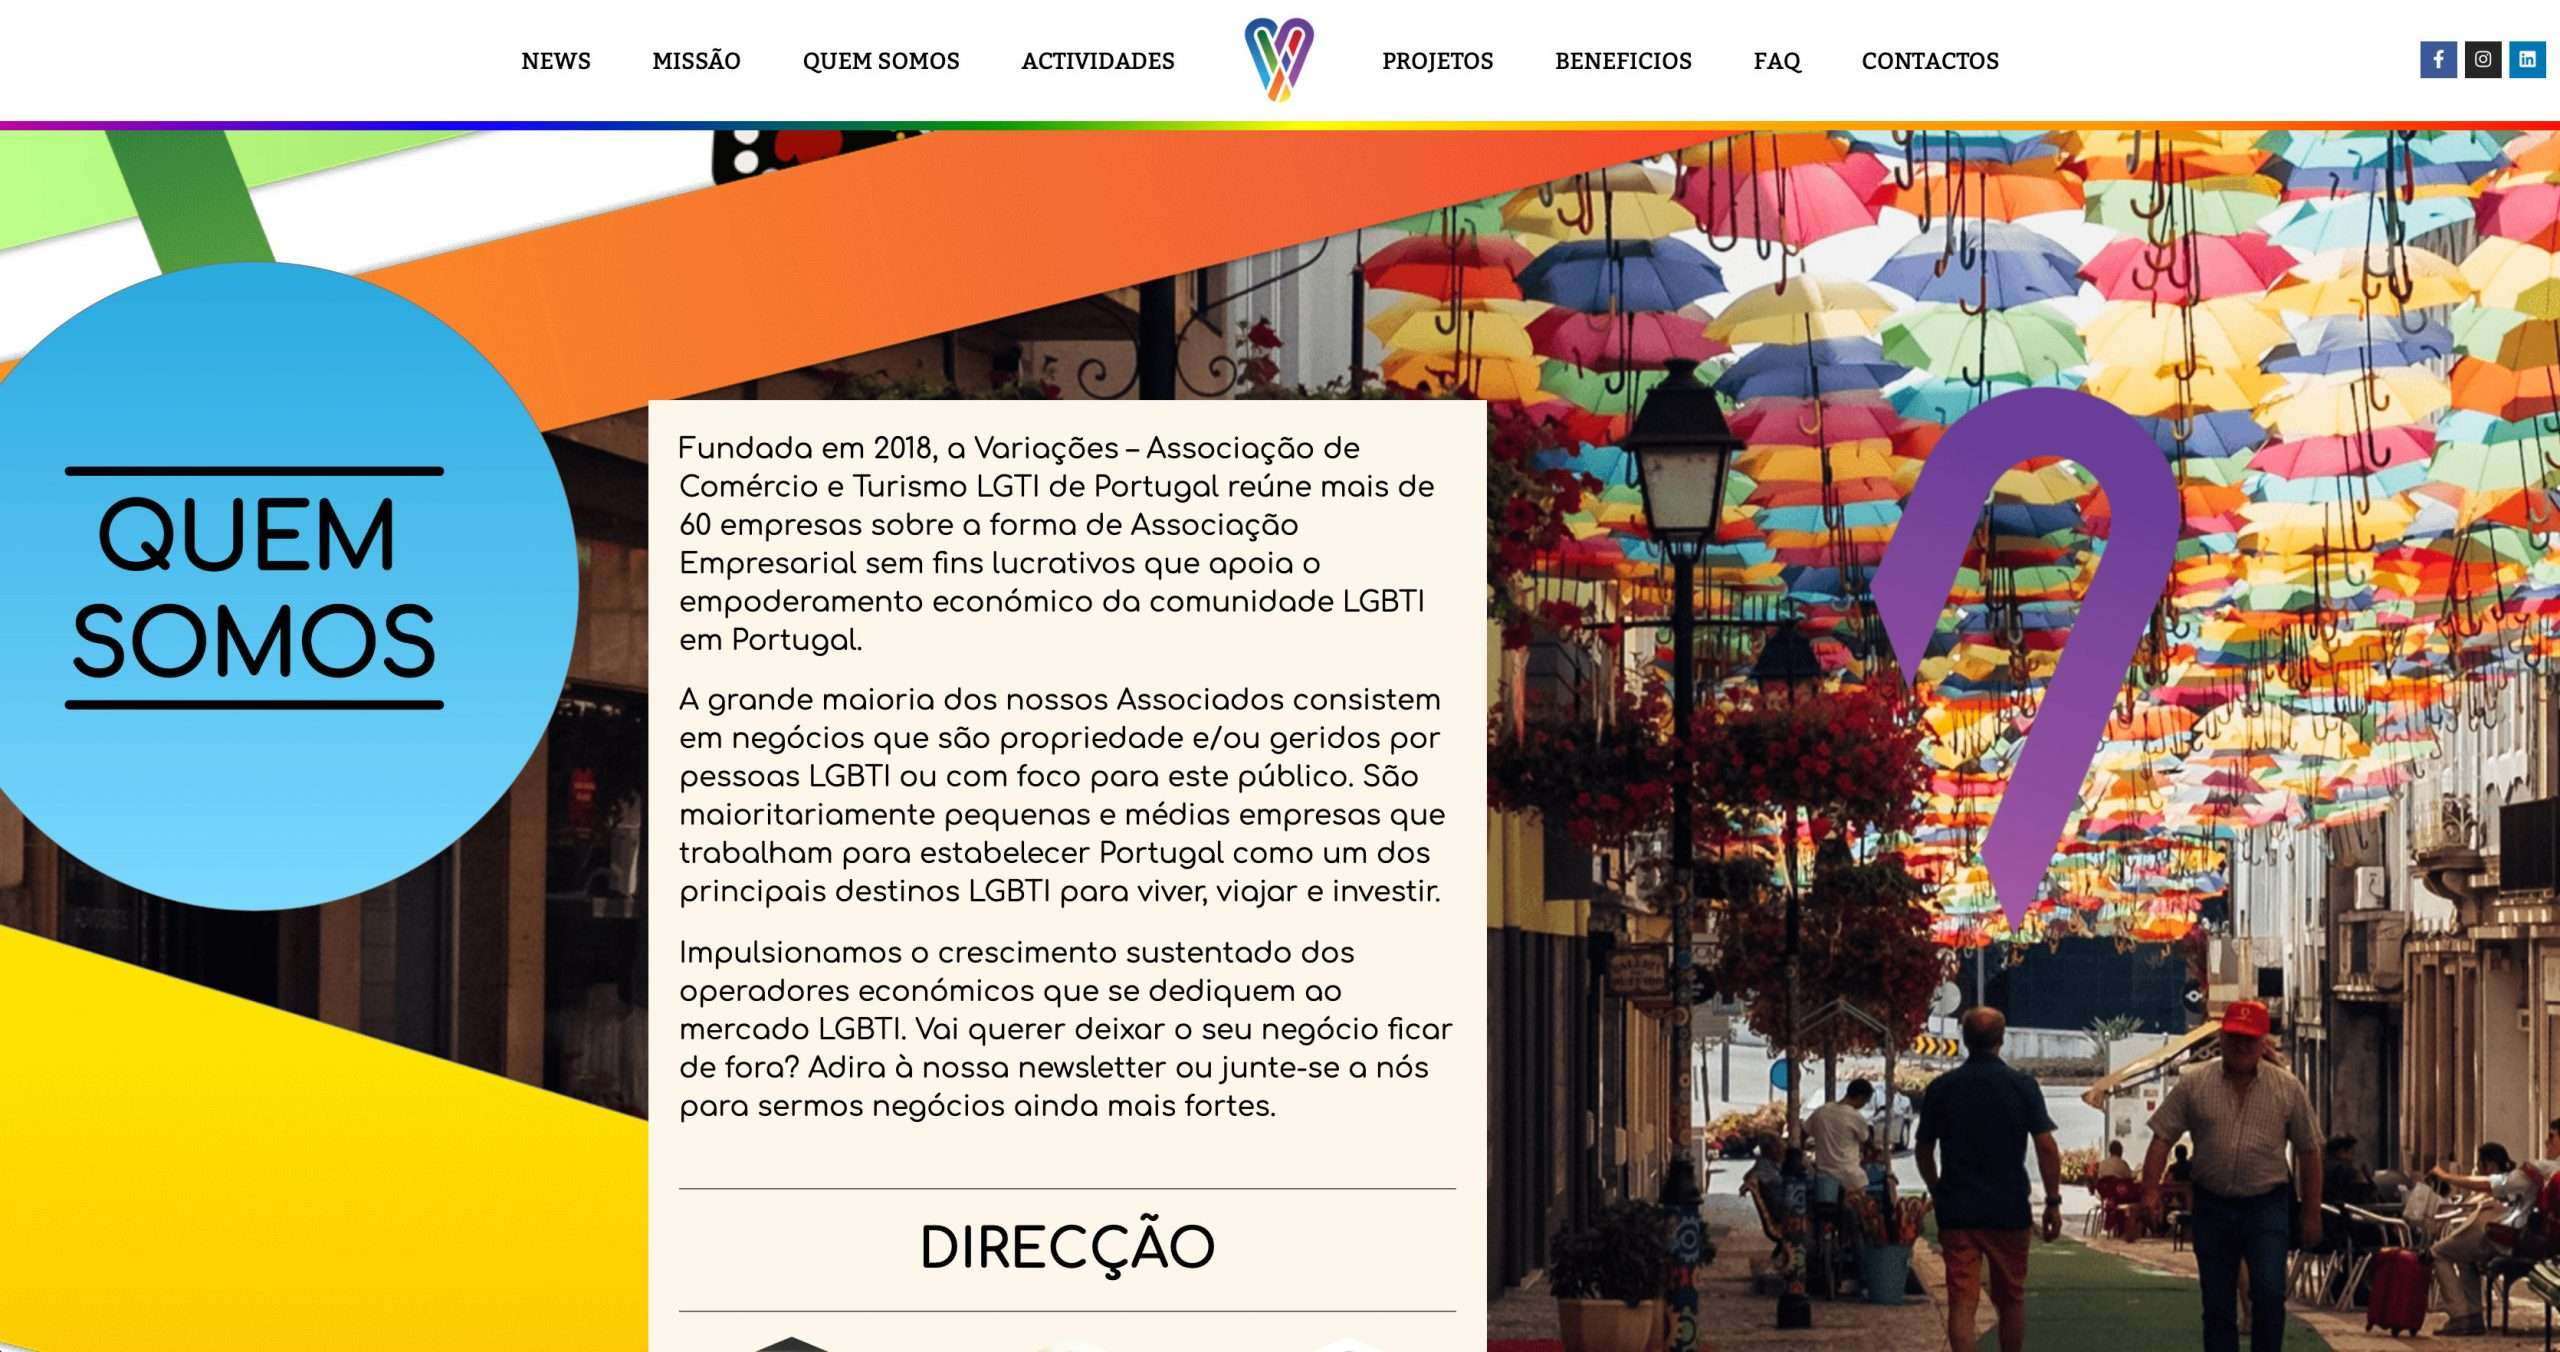 variacoes-online-lab-lisbon-web-development-web-digital-marketing-agency-design-2